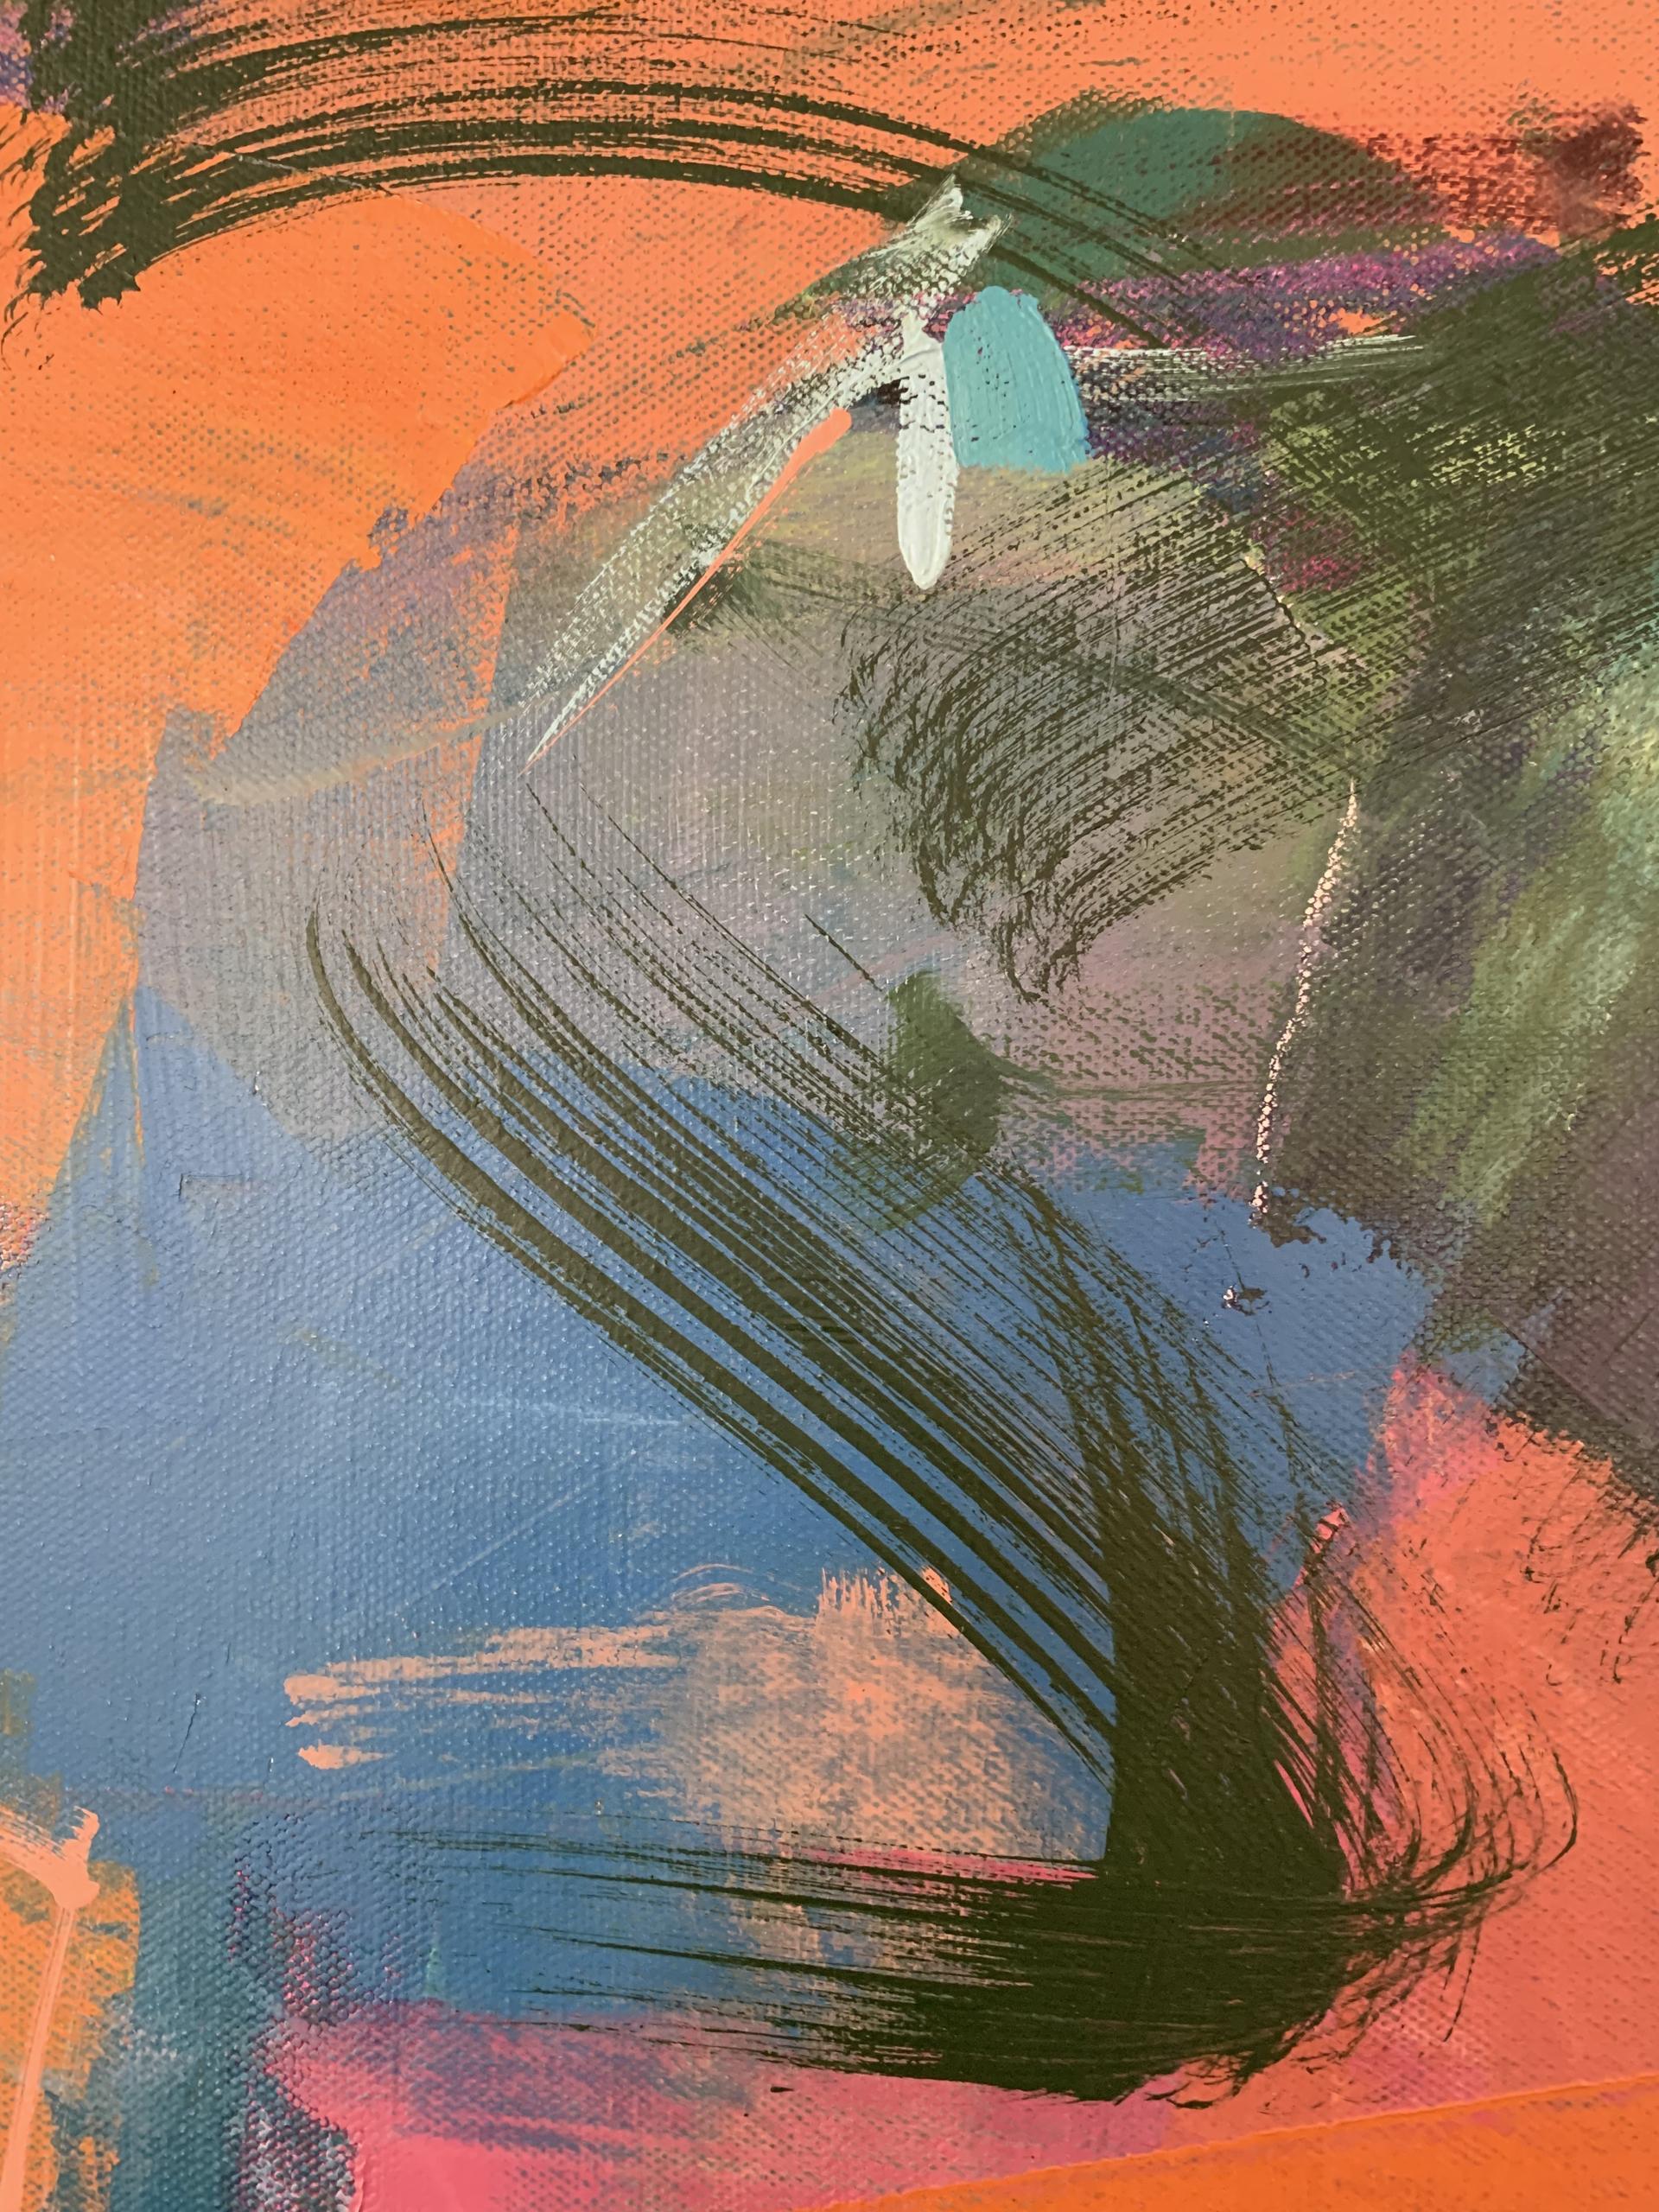 Apricot Jam by Marissa Vogl